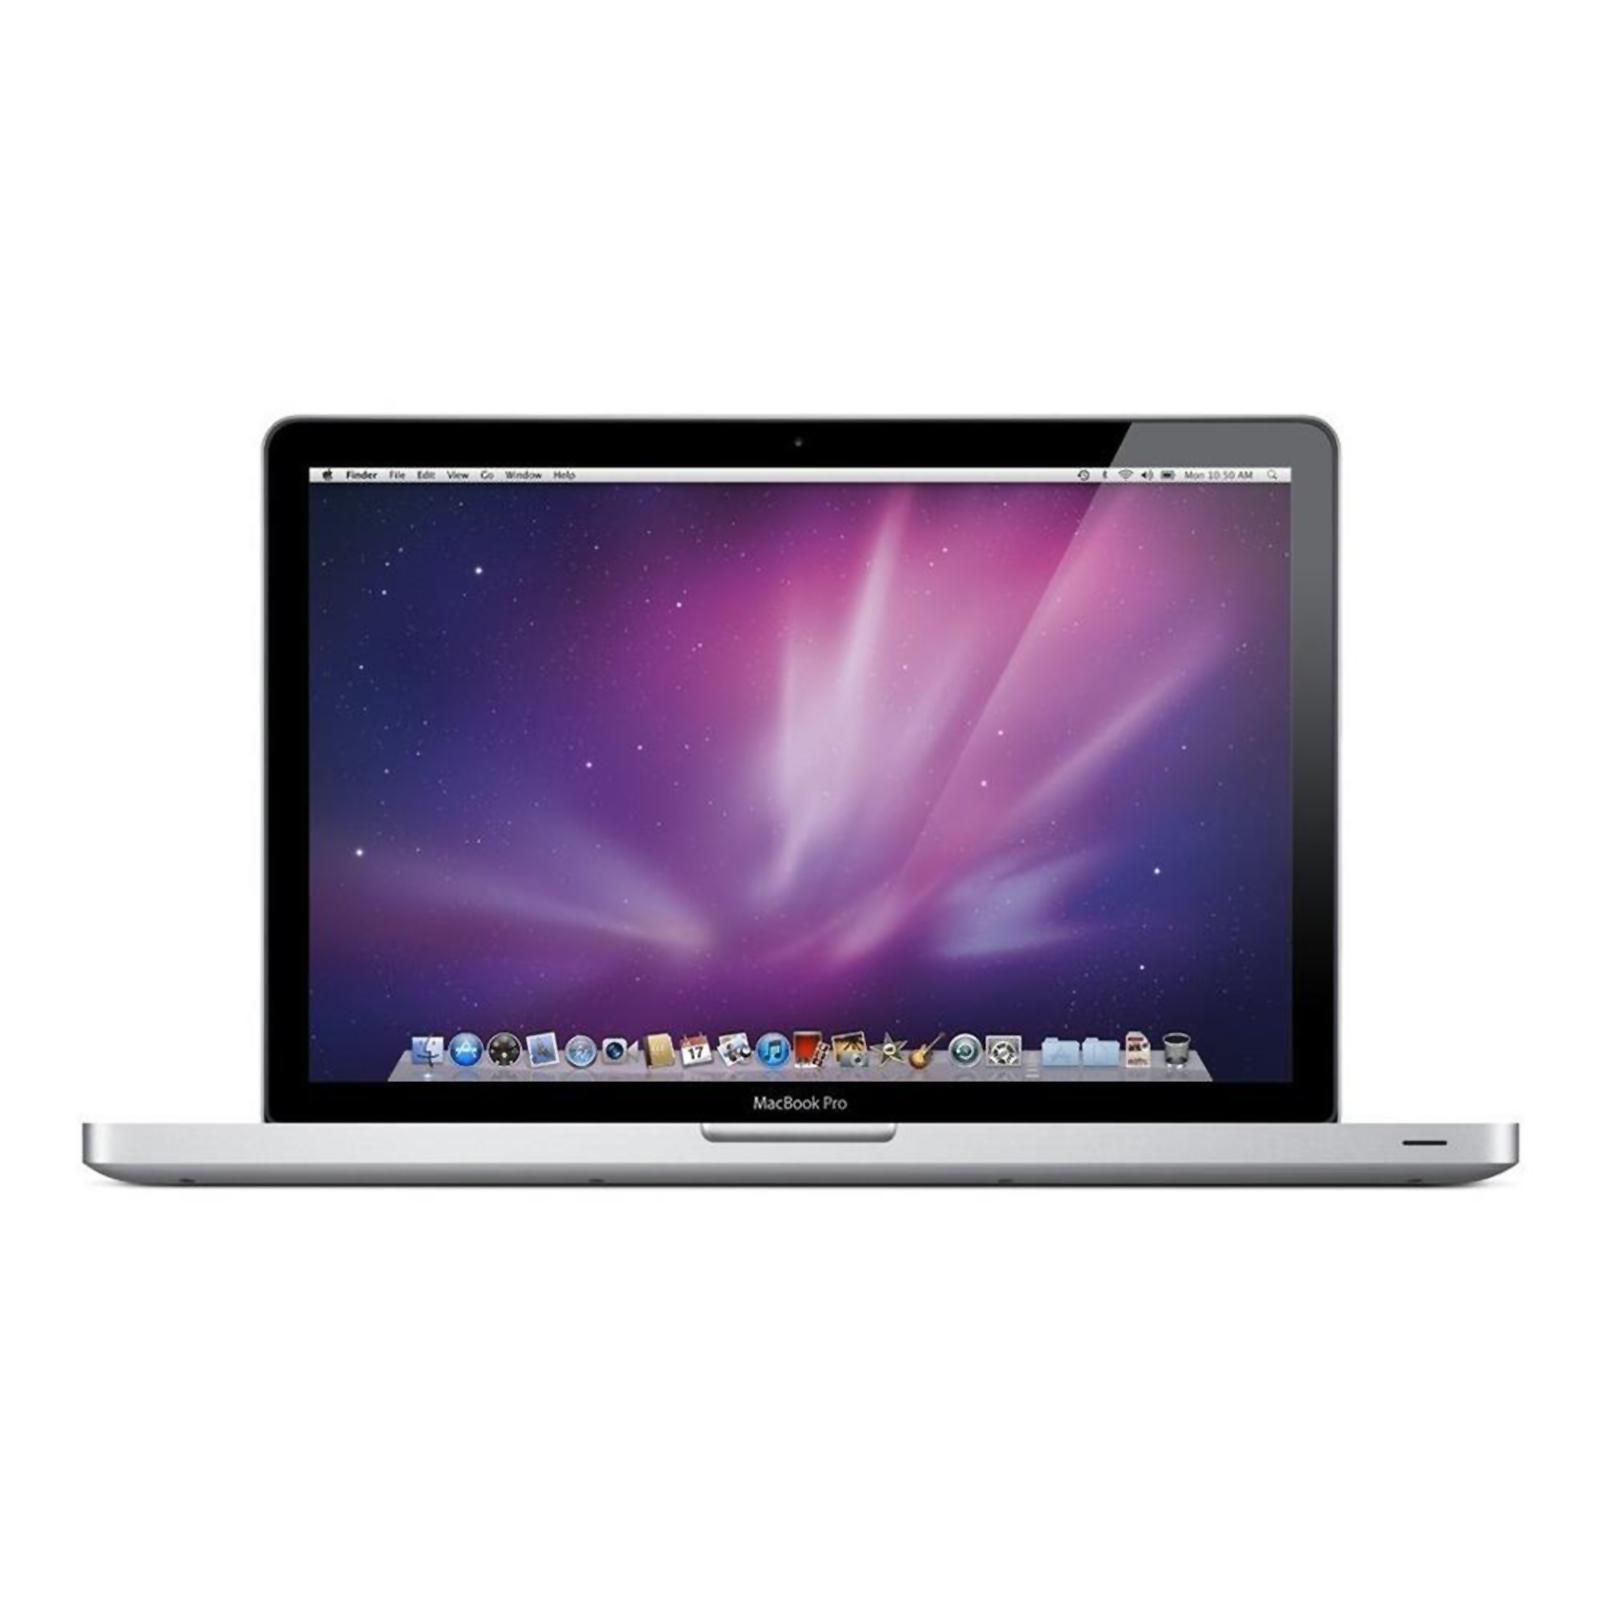 "Apple Refurbished Apple MacBook Pro MC721LL/A Intel Core i7-2635QM X4 2.0GHz 4GB 500GB 15.4"",Silver(Scratch and Dent) PartNumber: SPM10387140418"